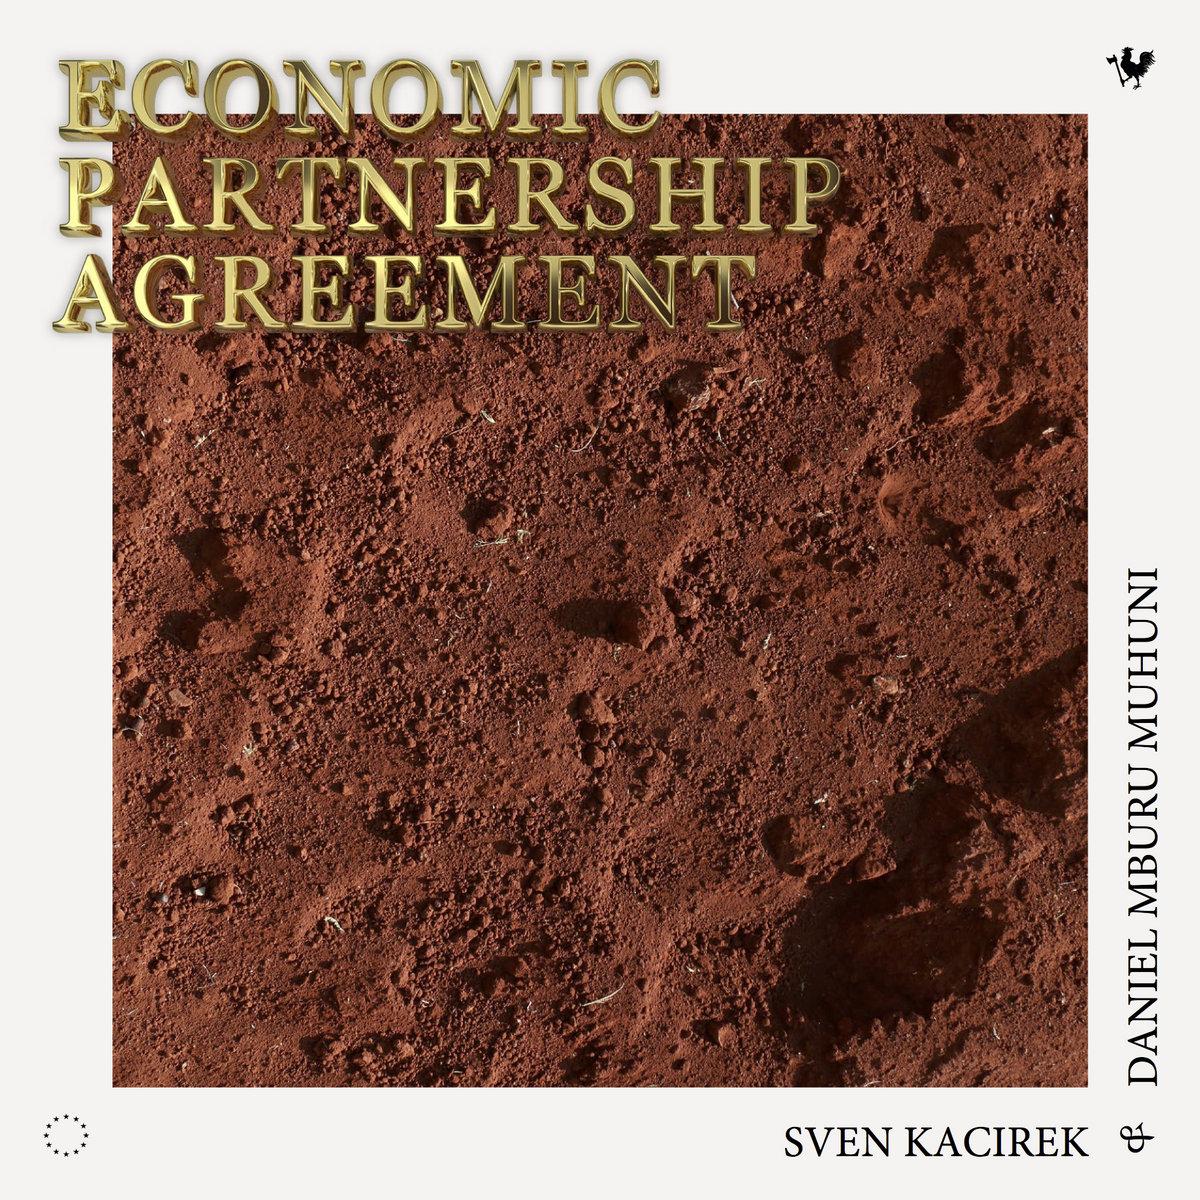 Economic Partnership Agreement Sven Kacirek